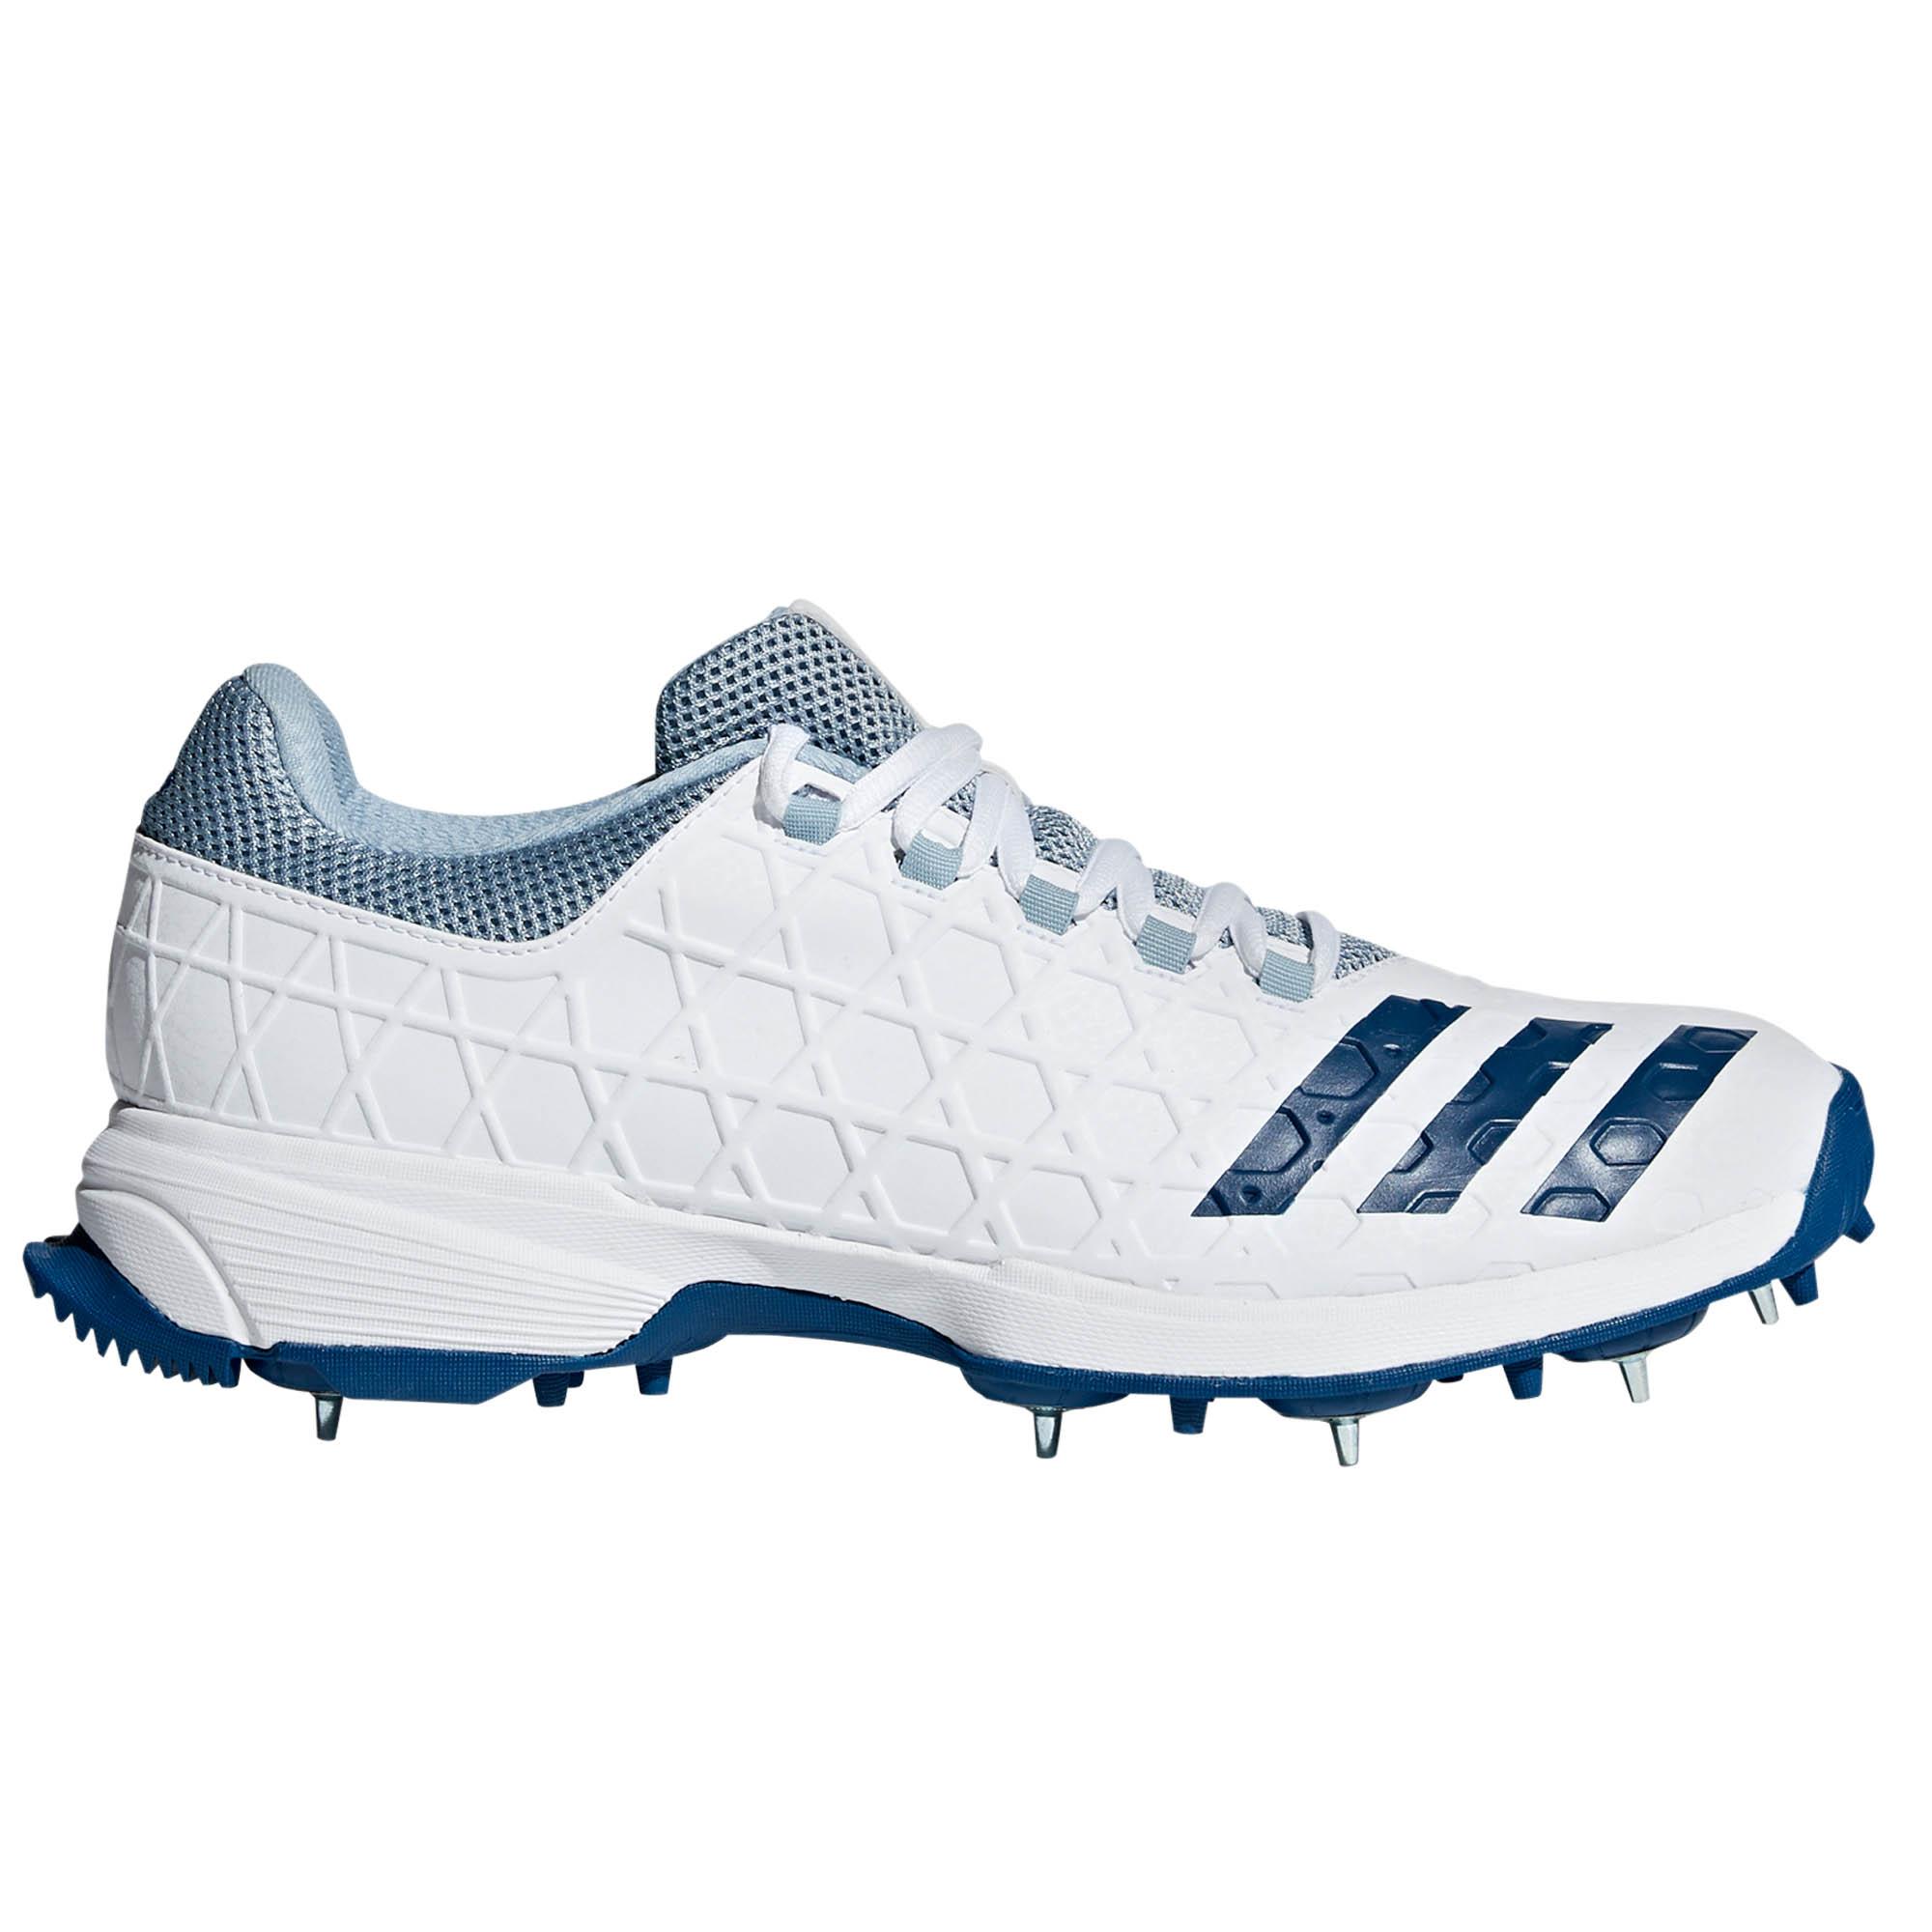 Mens Shoe Ii Spike Adidas Adult Sl22 Cricket Trainer Whiteblue Fs 87w8tTxqP